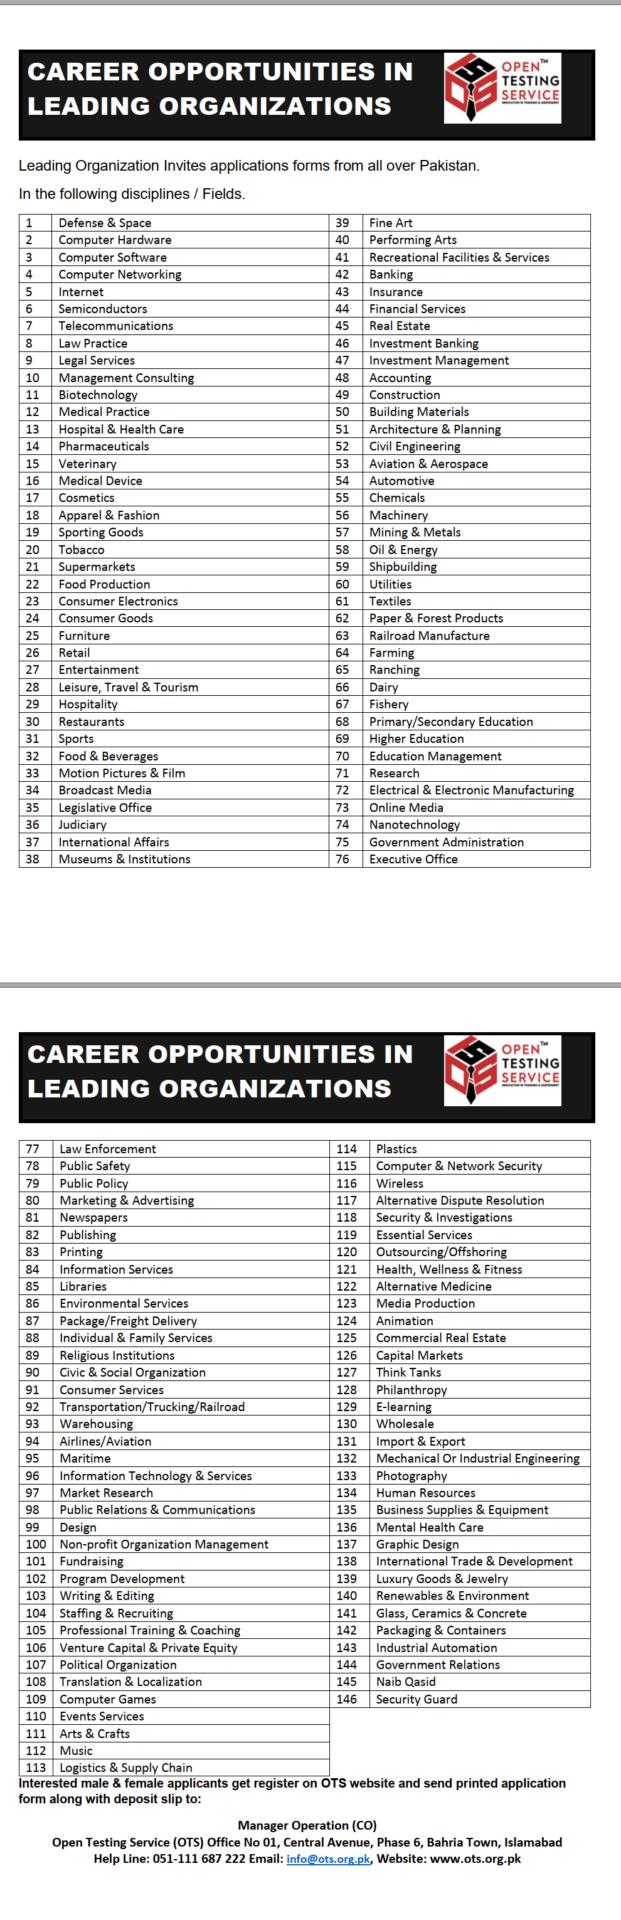 Leading Organization Jobs OTS Shortlisted List Roll No Slip